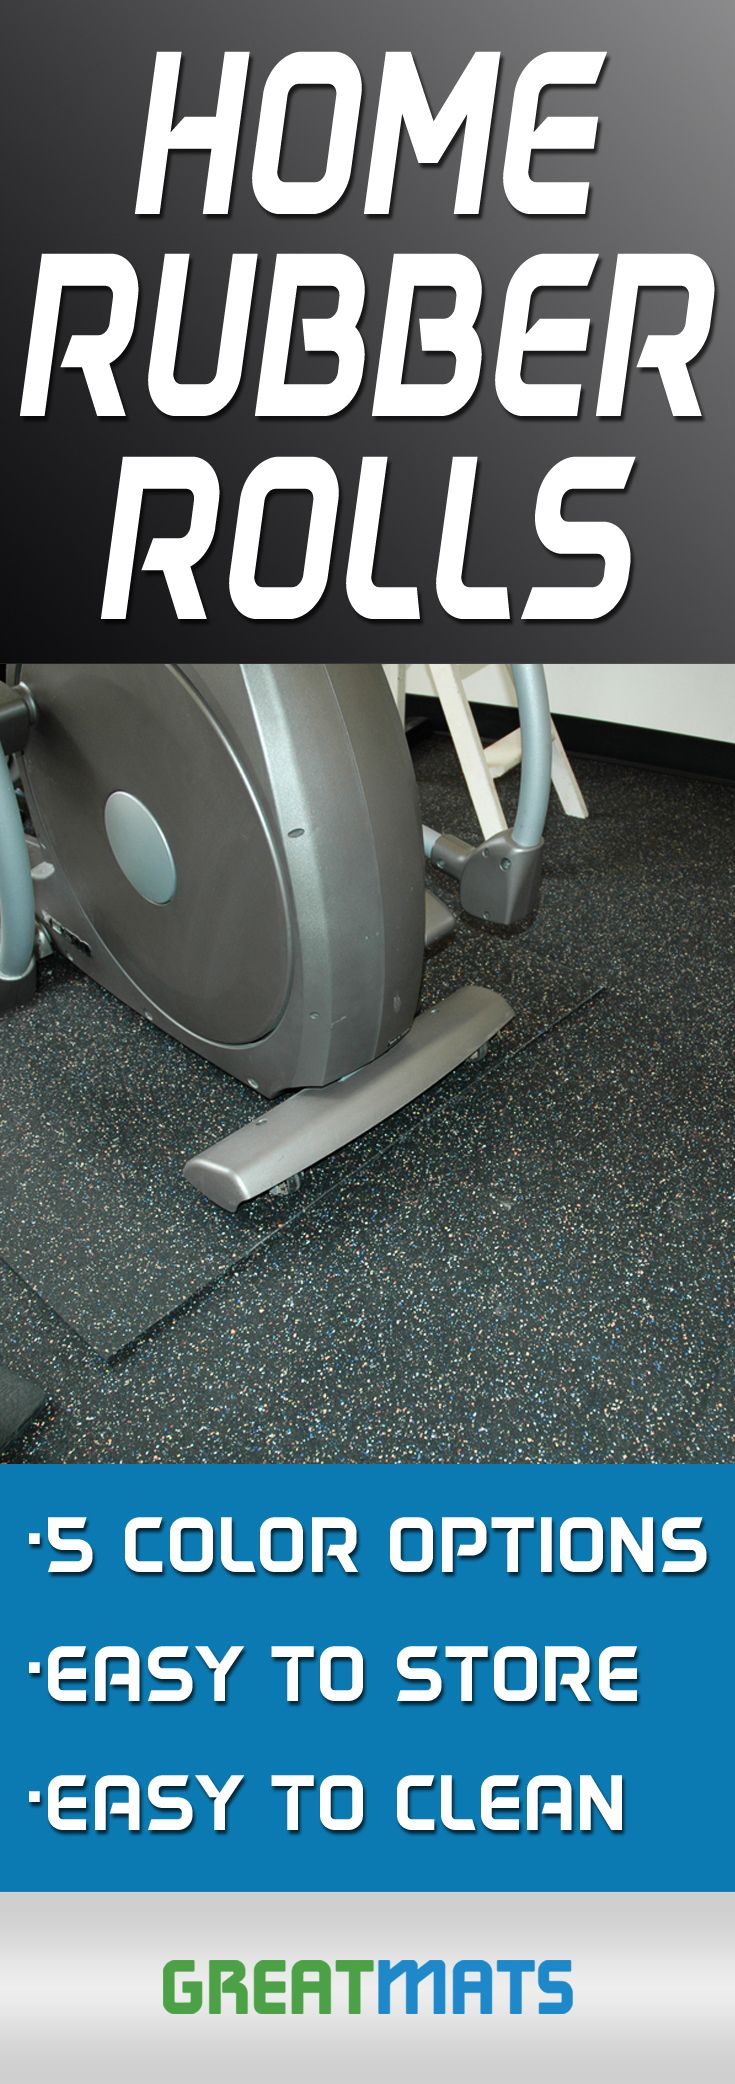 Mini cooper rubber floor mats uk - Rubber Flooring Rolls 1 4 Inch 4x10 Ft Colors